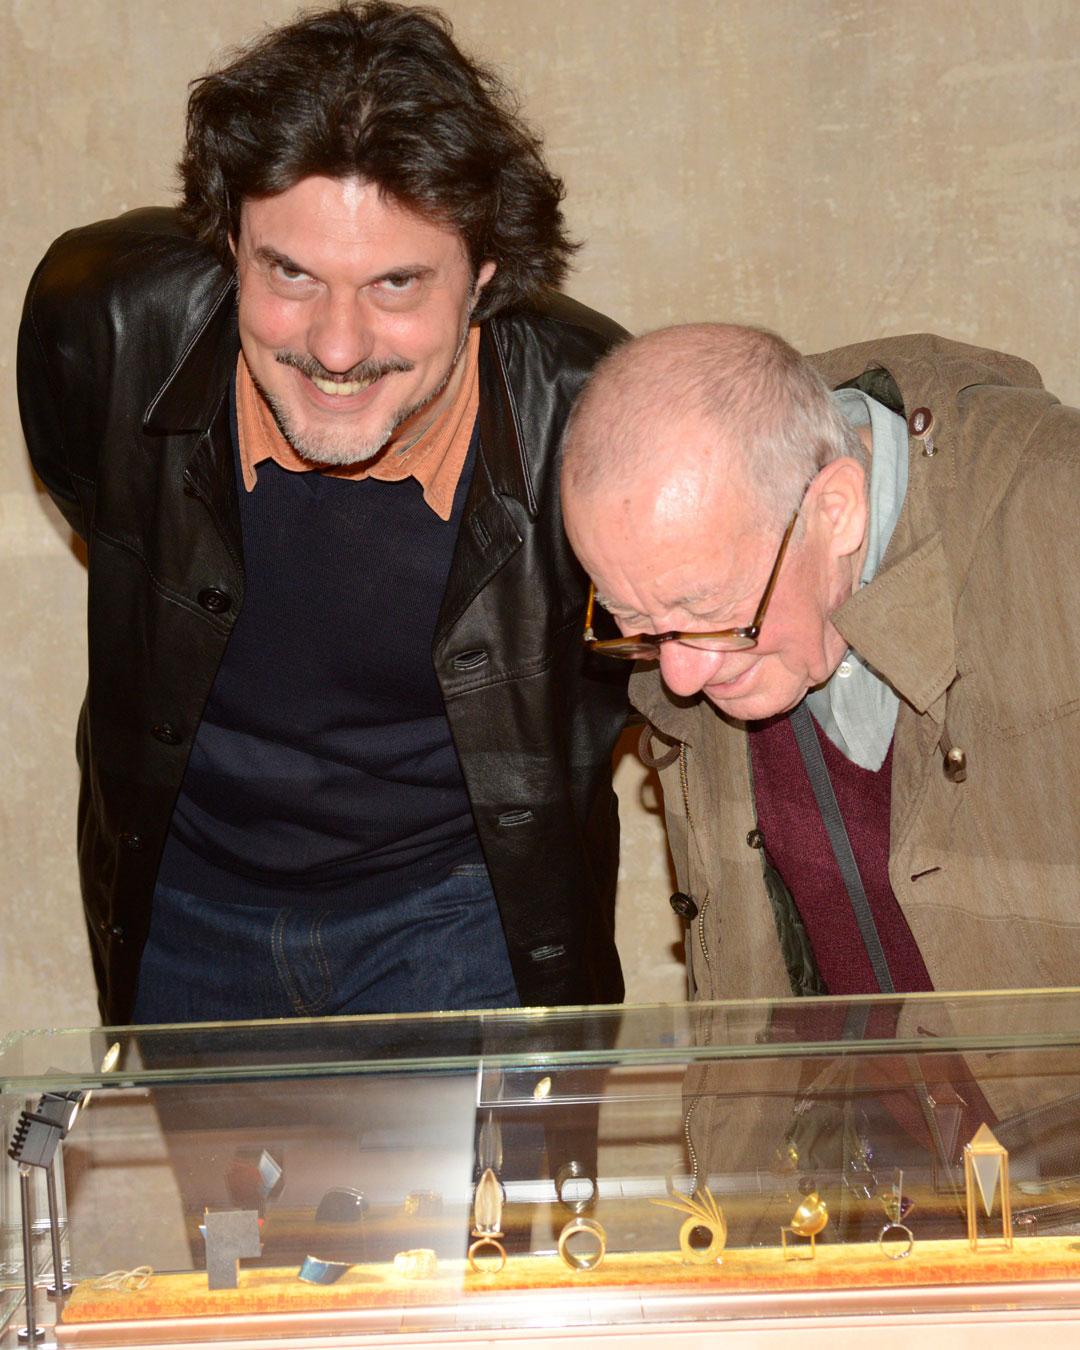 Stefano Marchetti and Francesco Pavan